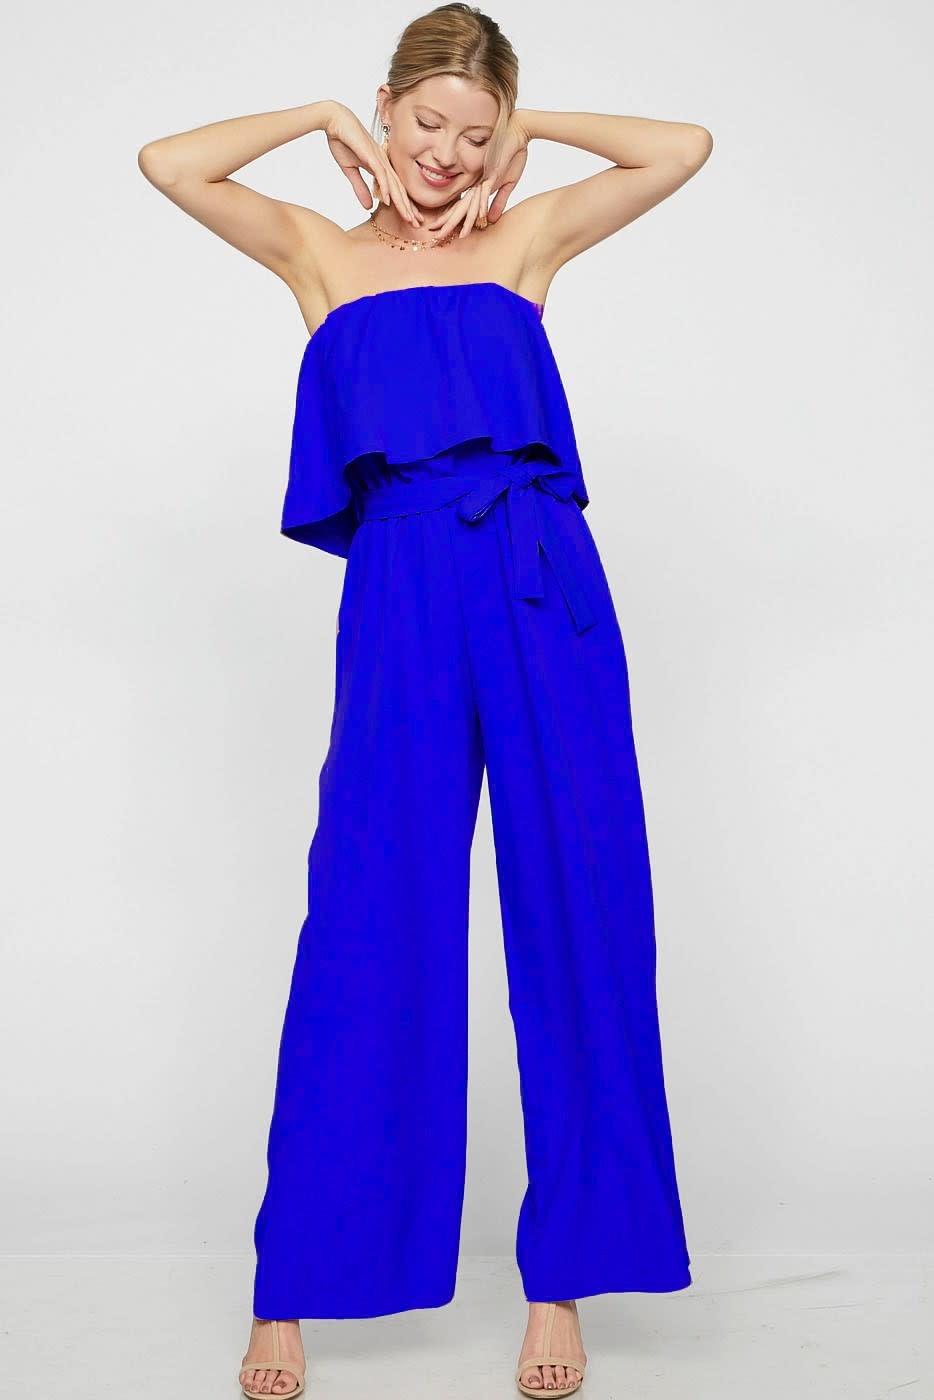 Crepe Woven Tube Top Jumpsuit w/ Tie Waist